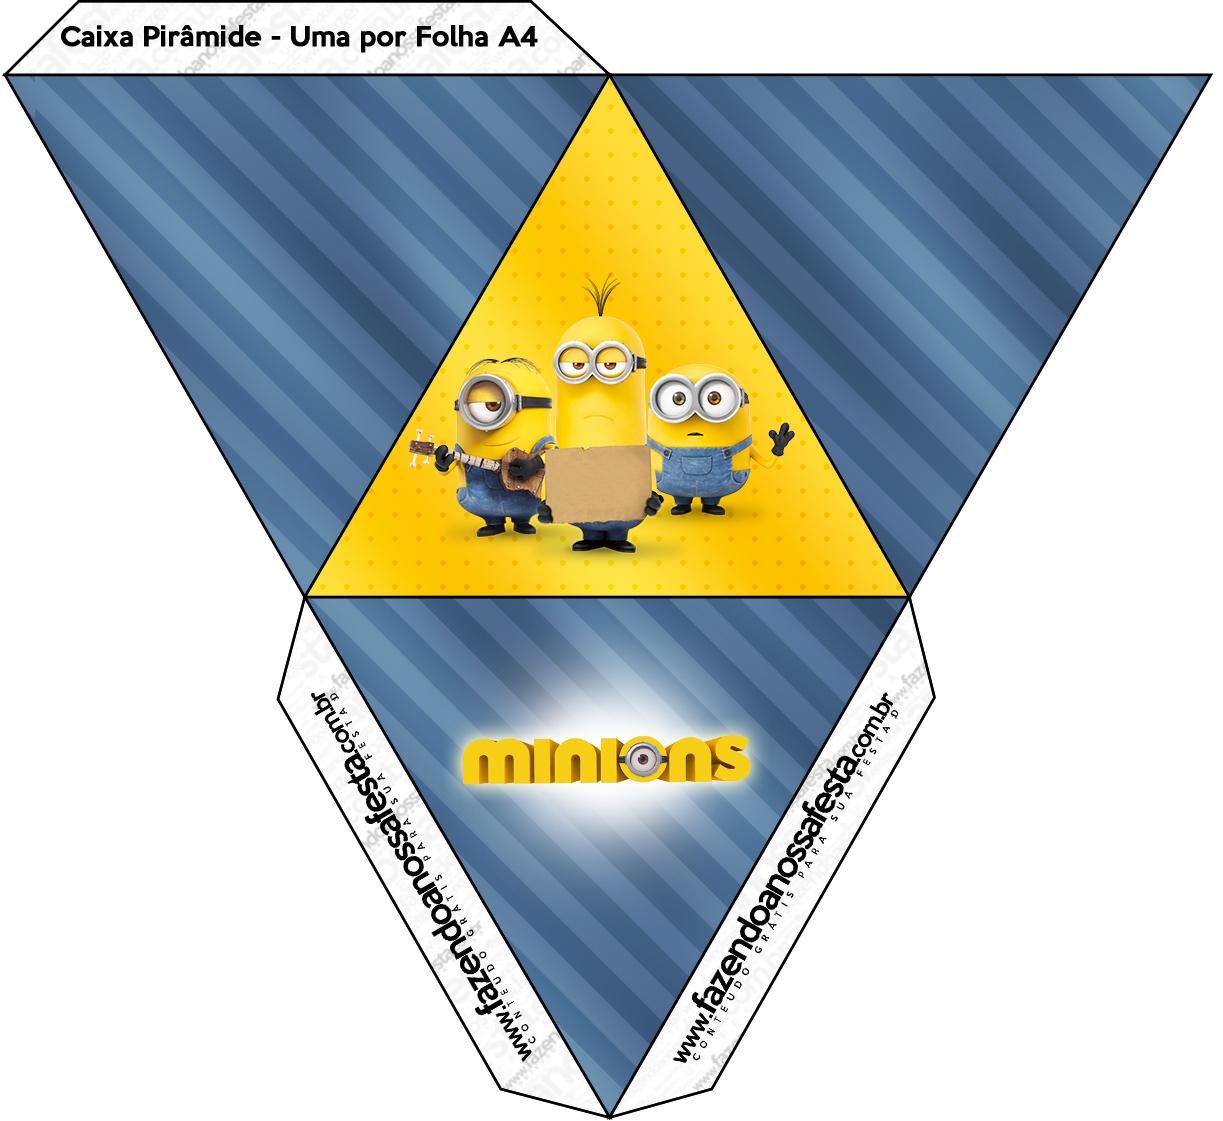 Caixa Pirâmide Os Minions